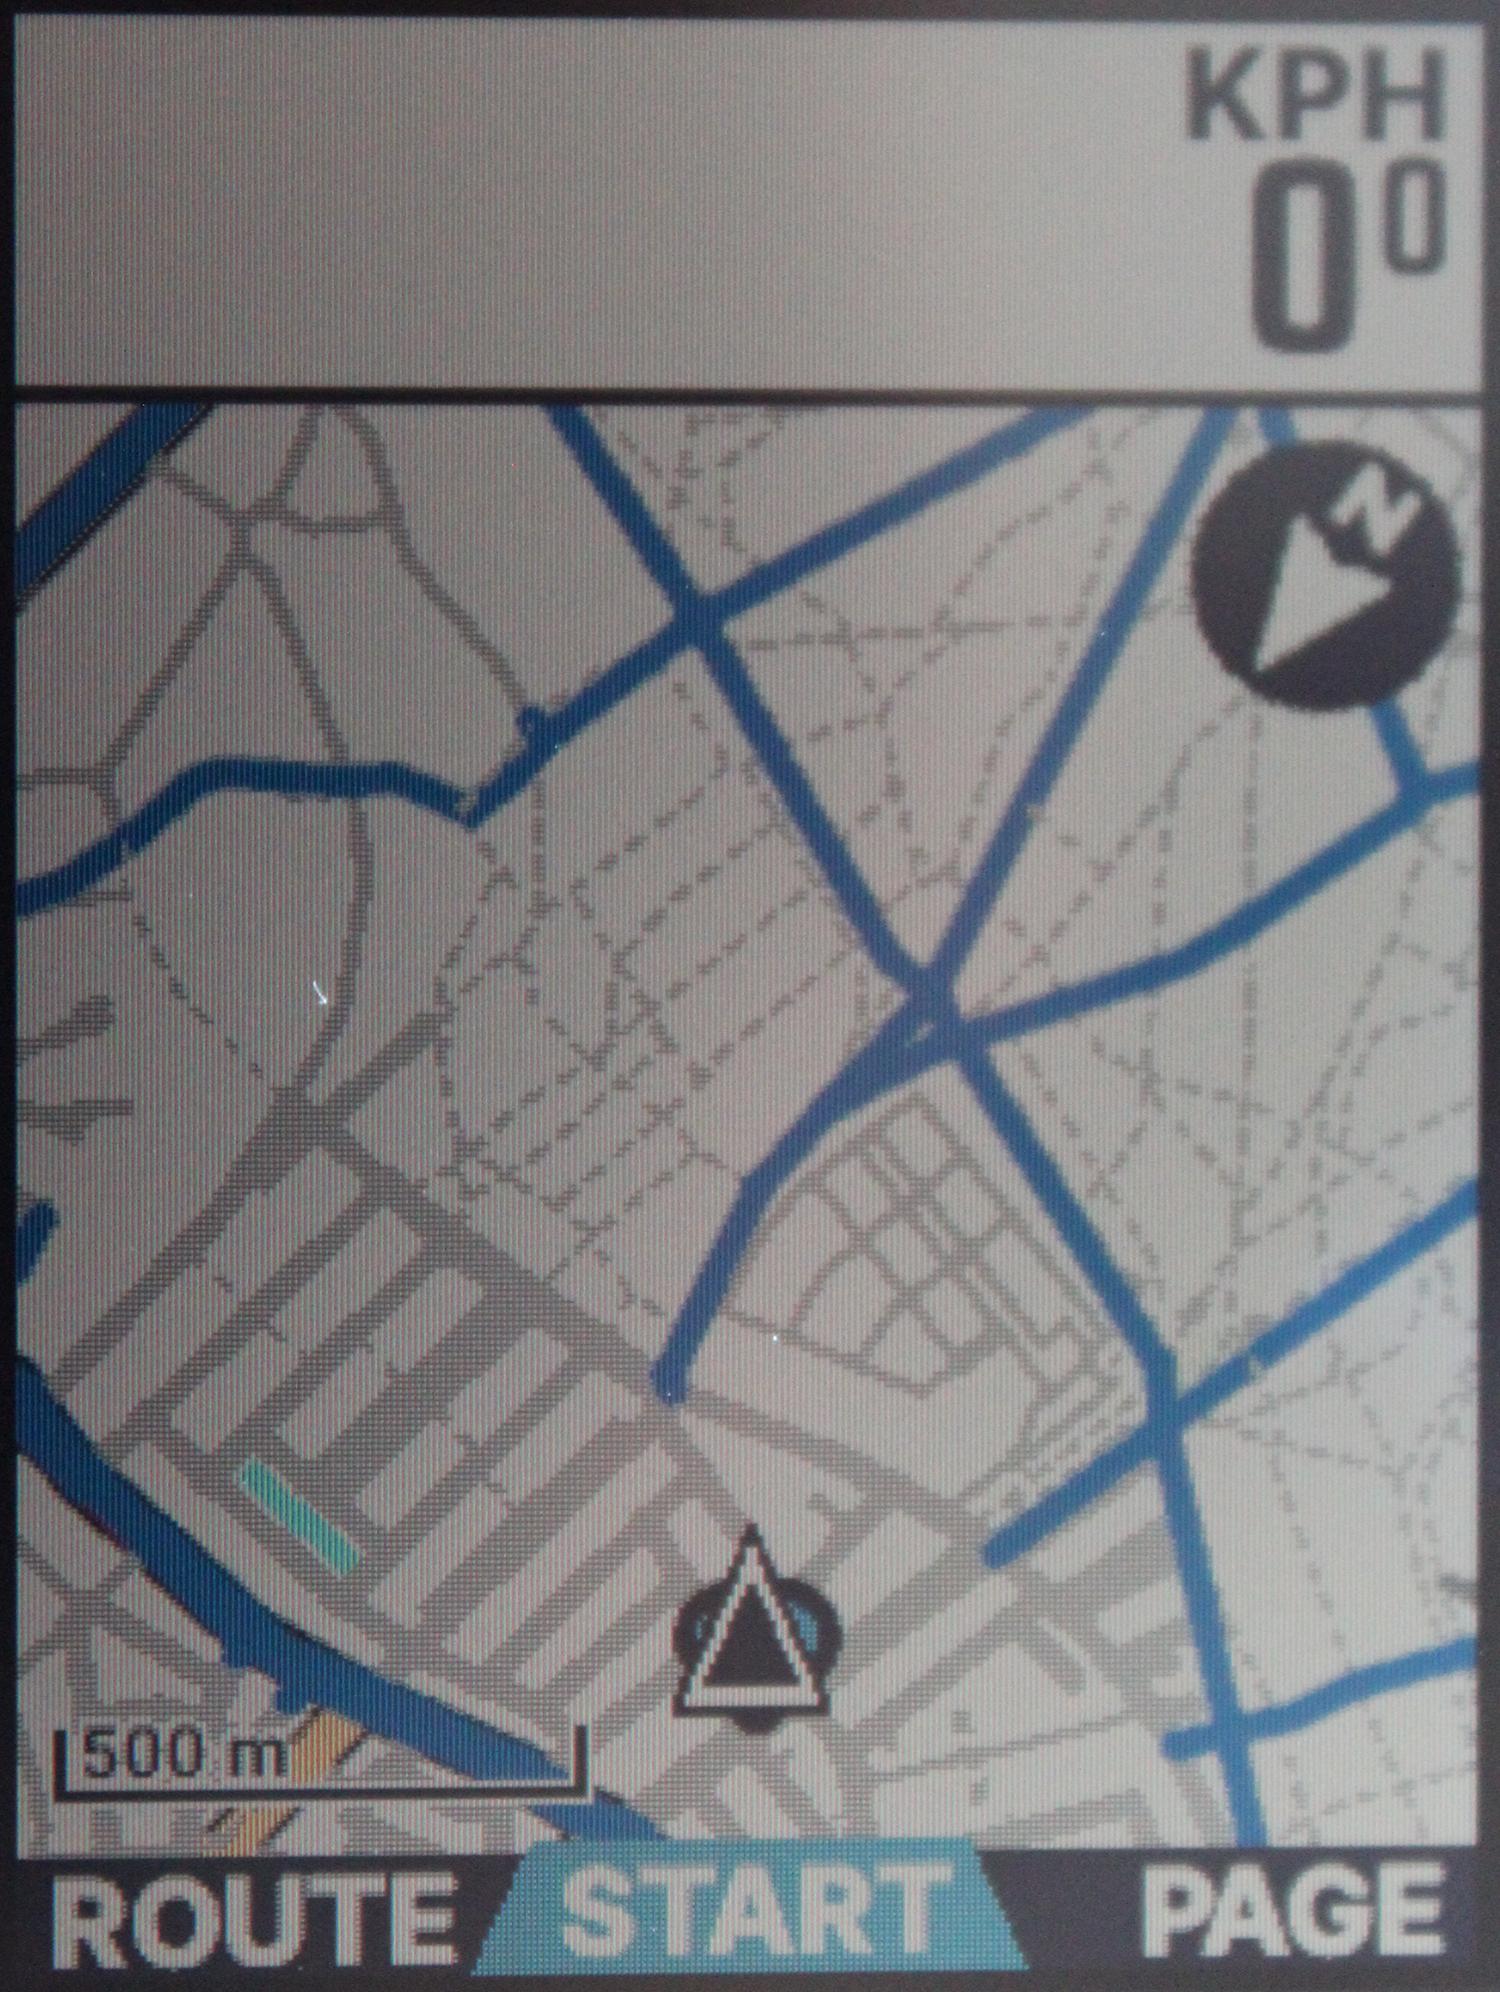 BOLT-Maps-detail